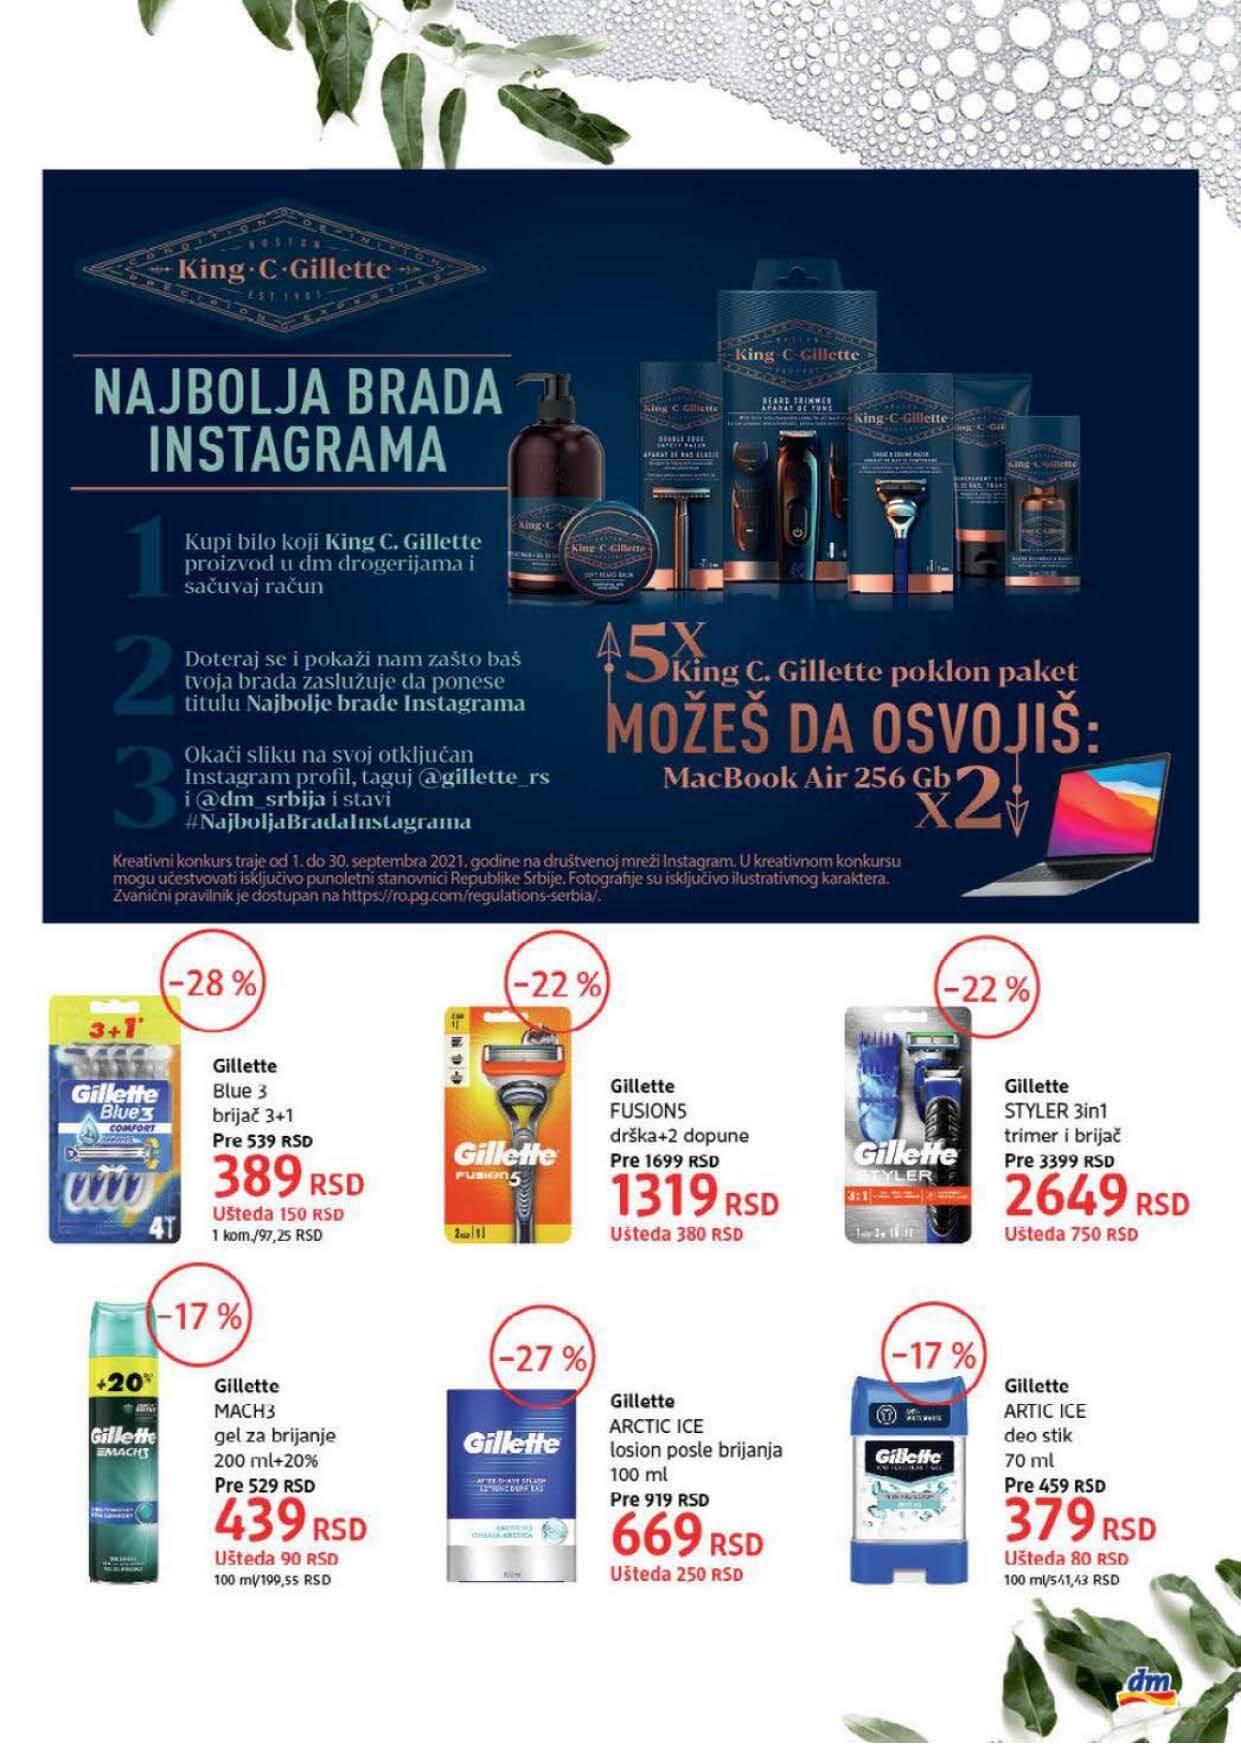 DM Katalog Srbija SEPTEMBAR 2021 1.9.2021. 30.9.2021. Page 21